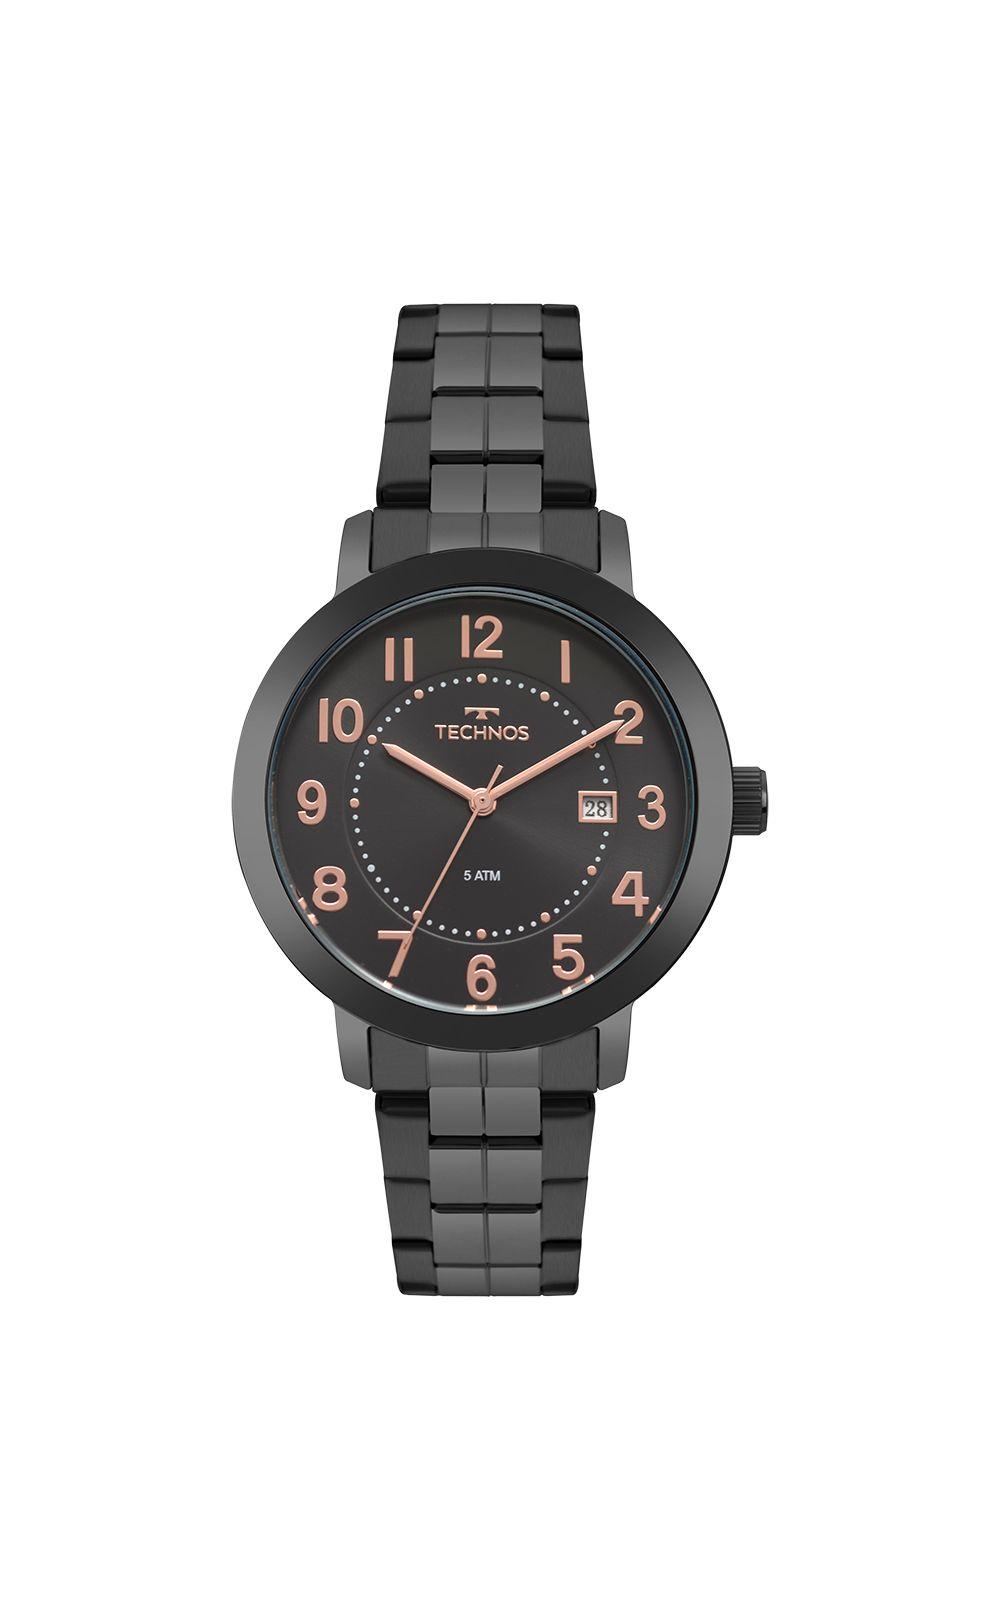 Relógio Technos Feminino Dress Preto 2115MRV 4P. undefined 05a1b93f67